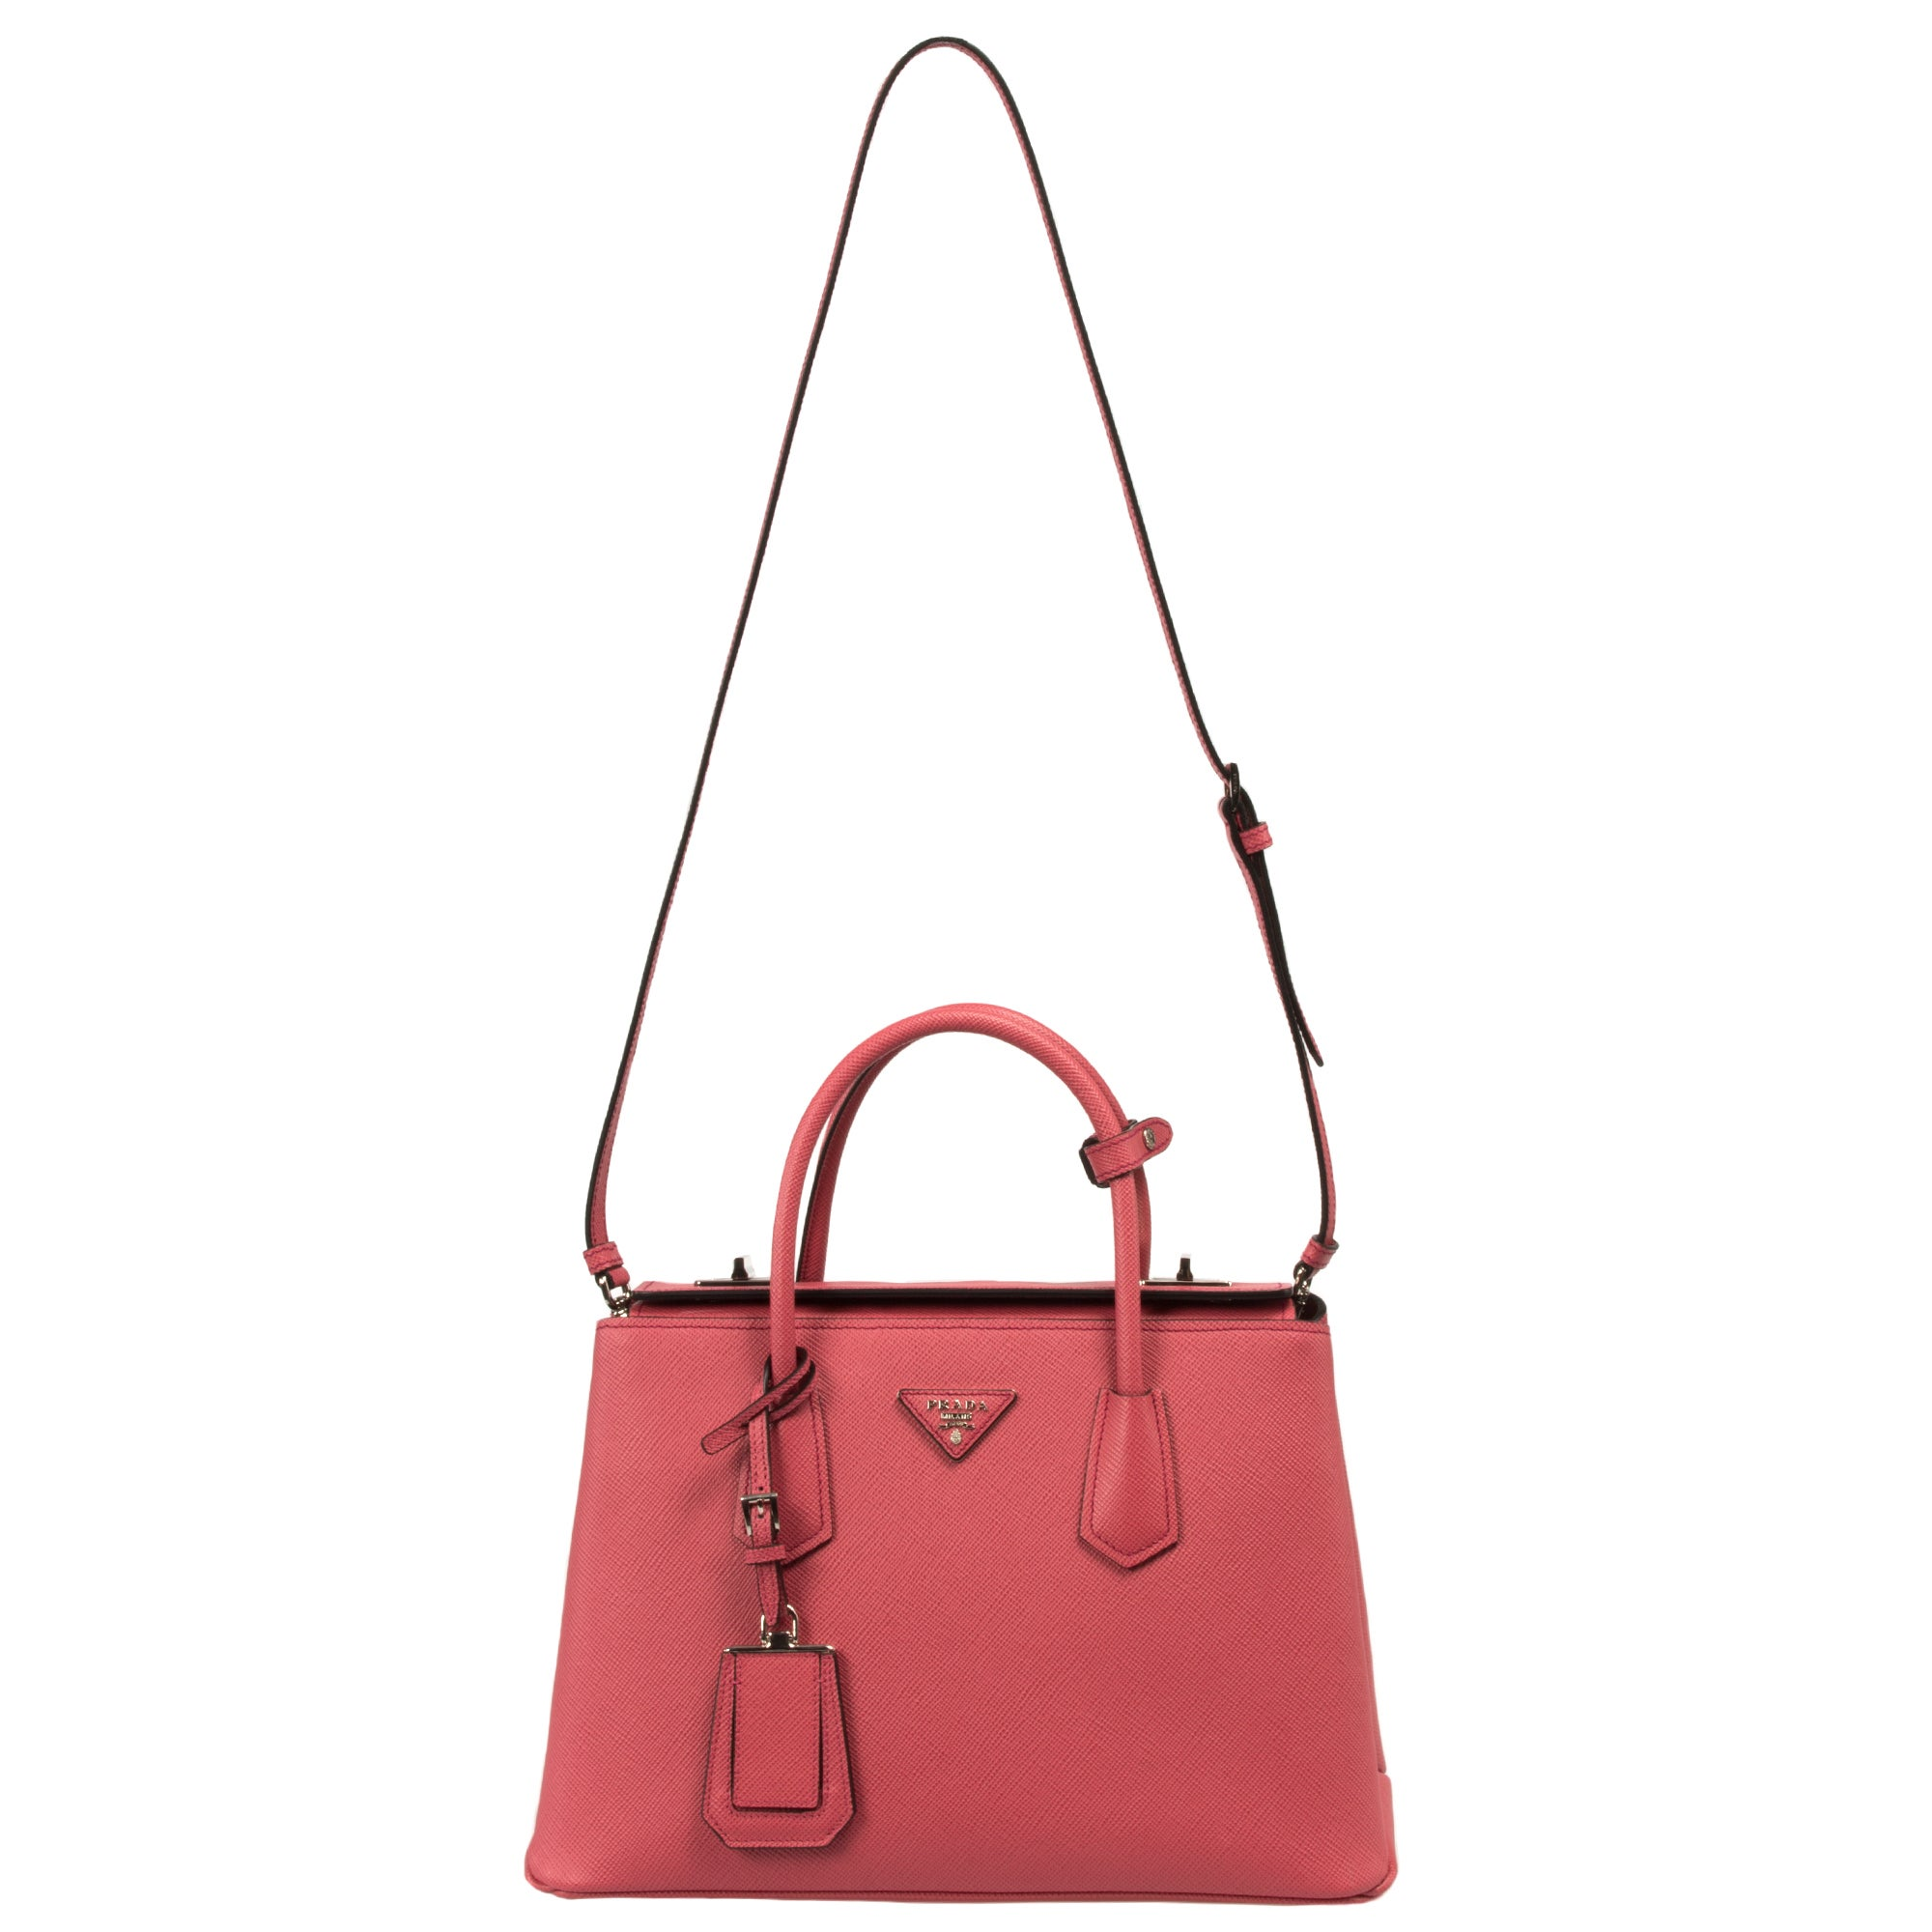 3bd999391e7a ... where can i buy shop prada bn2823 2a4a f060m saffiano cuir leather  tamaris pink tote bag